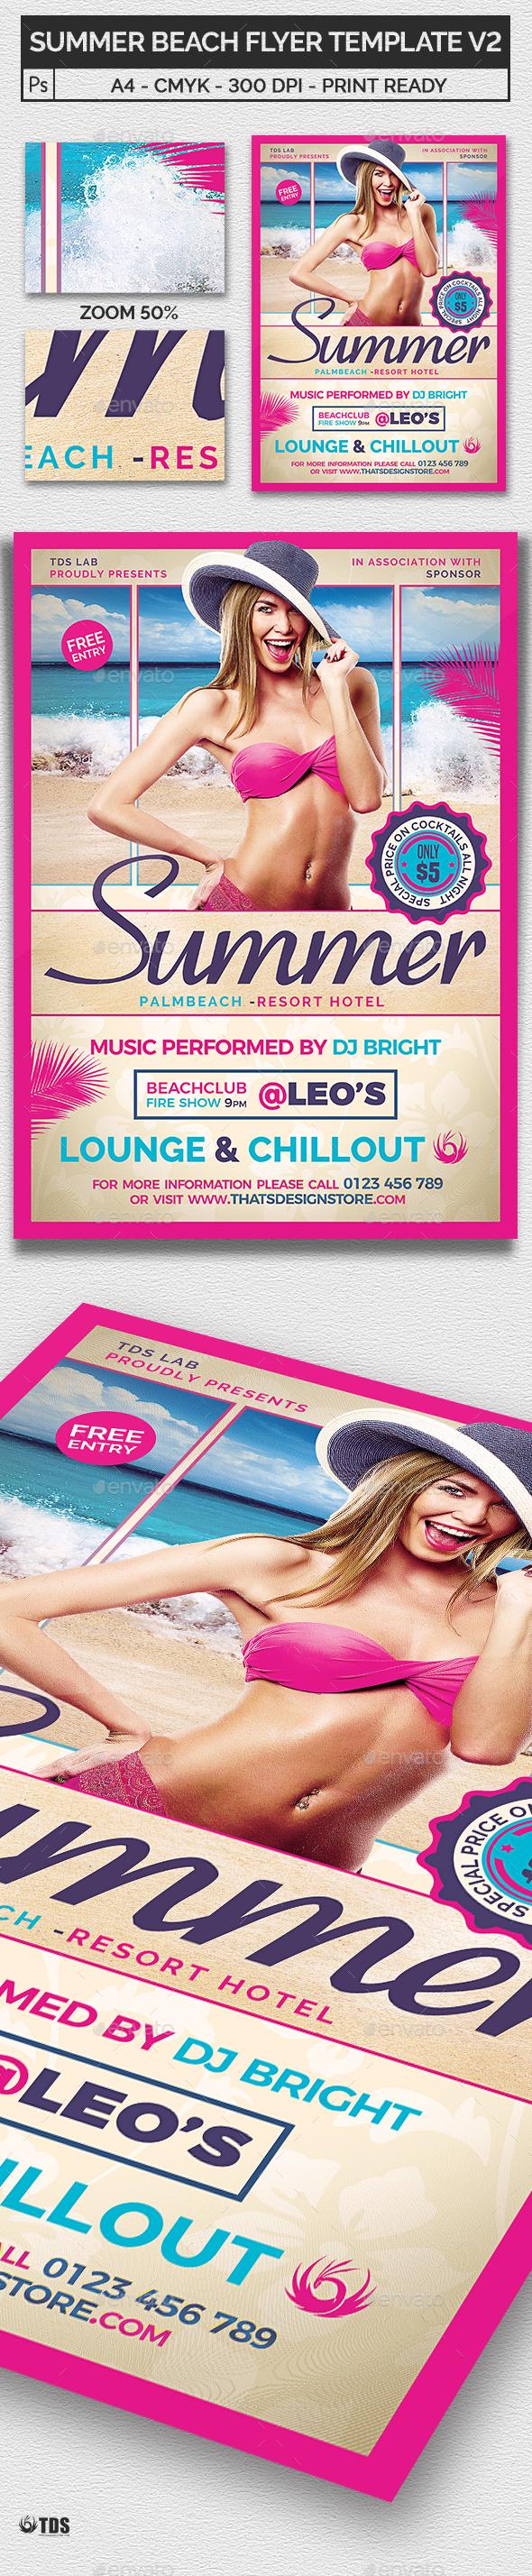 Summer Beach Flyer Template V2 - Clubs & Parties Events